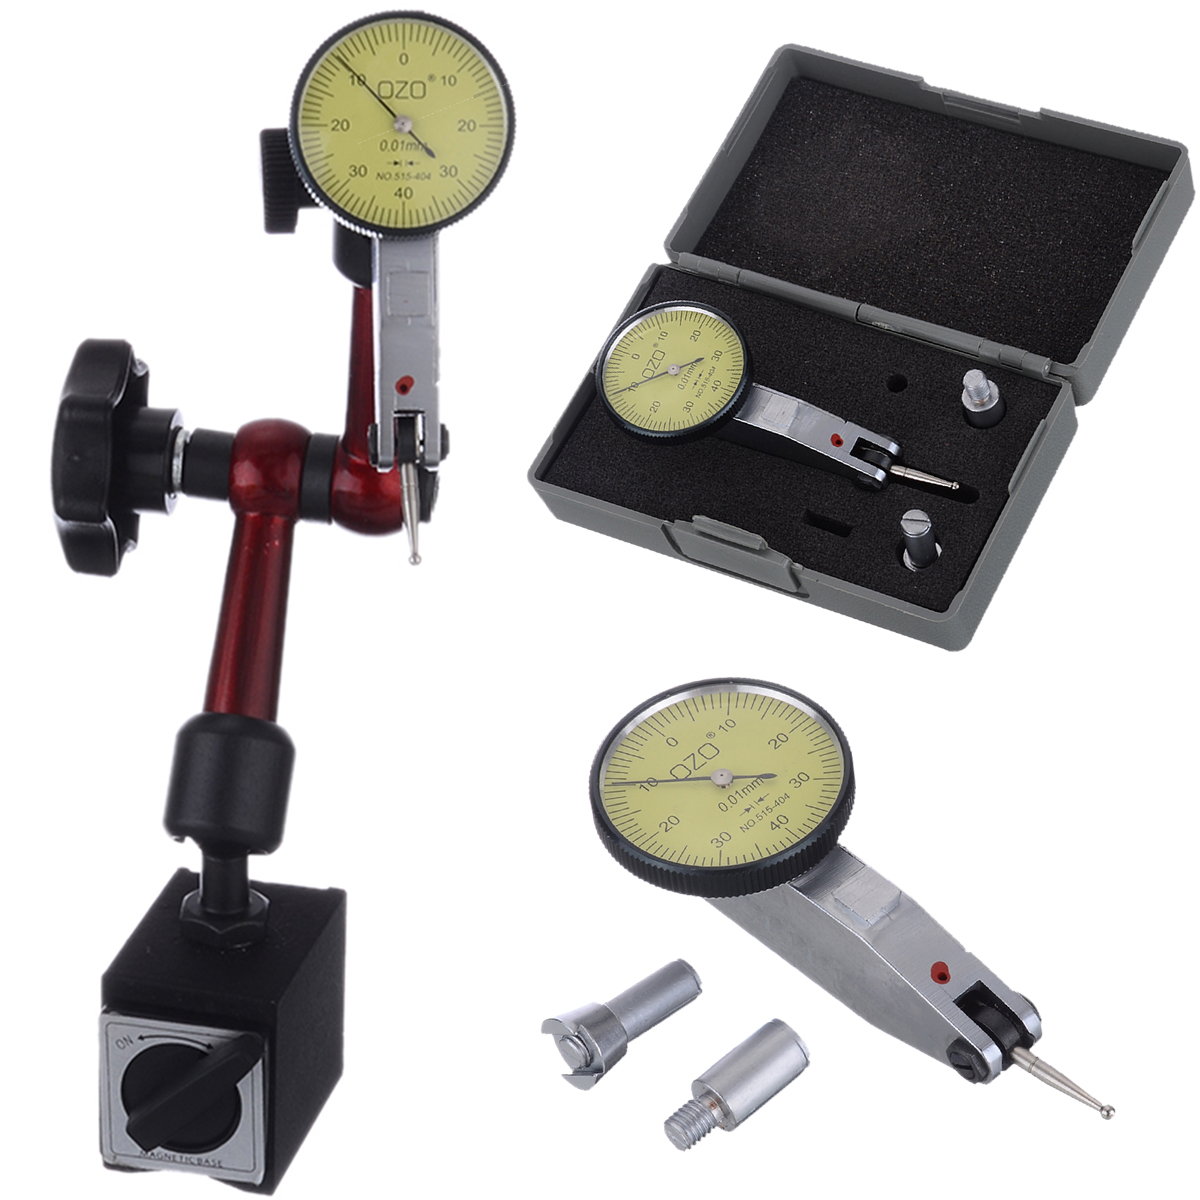 1 soporte de Base magnética Flexible + indicador de prueba de Dial de precisión de escala 0-0,8mm para herramientas de medición Sofirn SP33 potente linterna LED 26650 Cree XHP50 3000lm linterna táctica 18650 luz de Flash 6 modos con actualización de luz indicadora